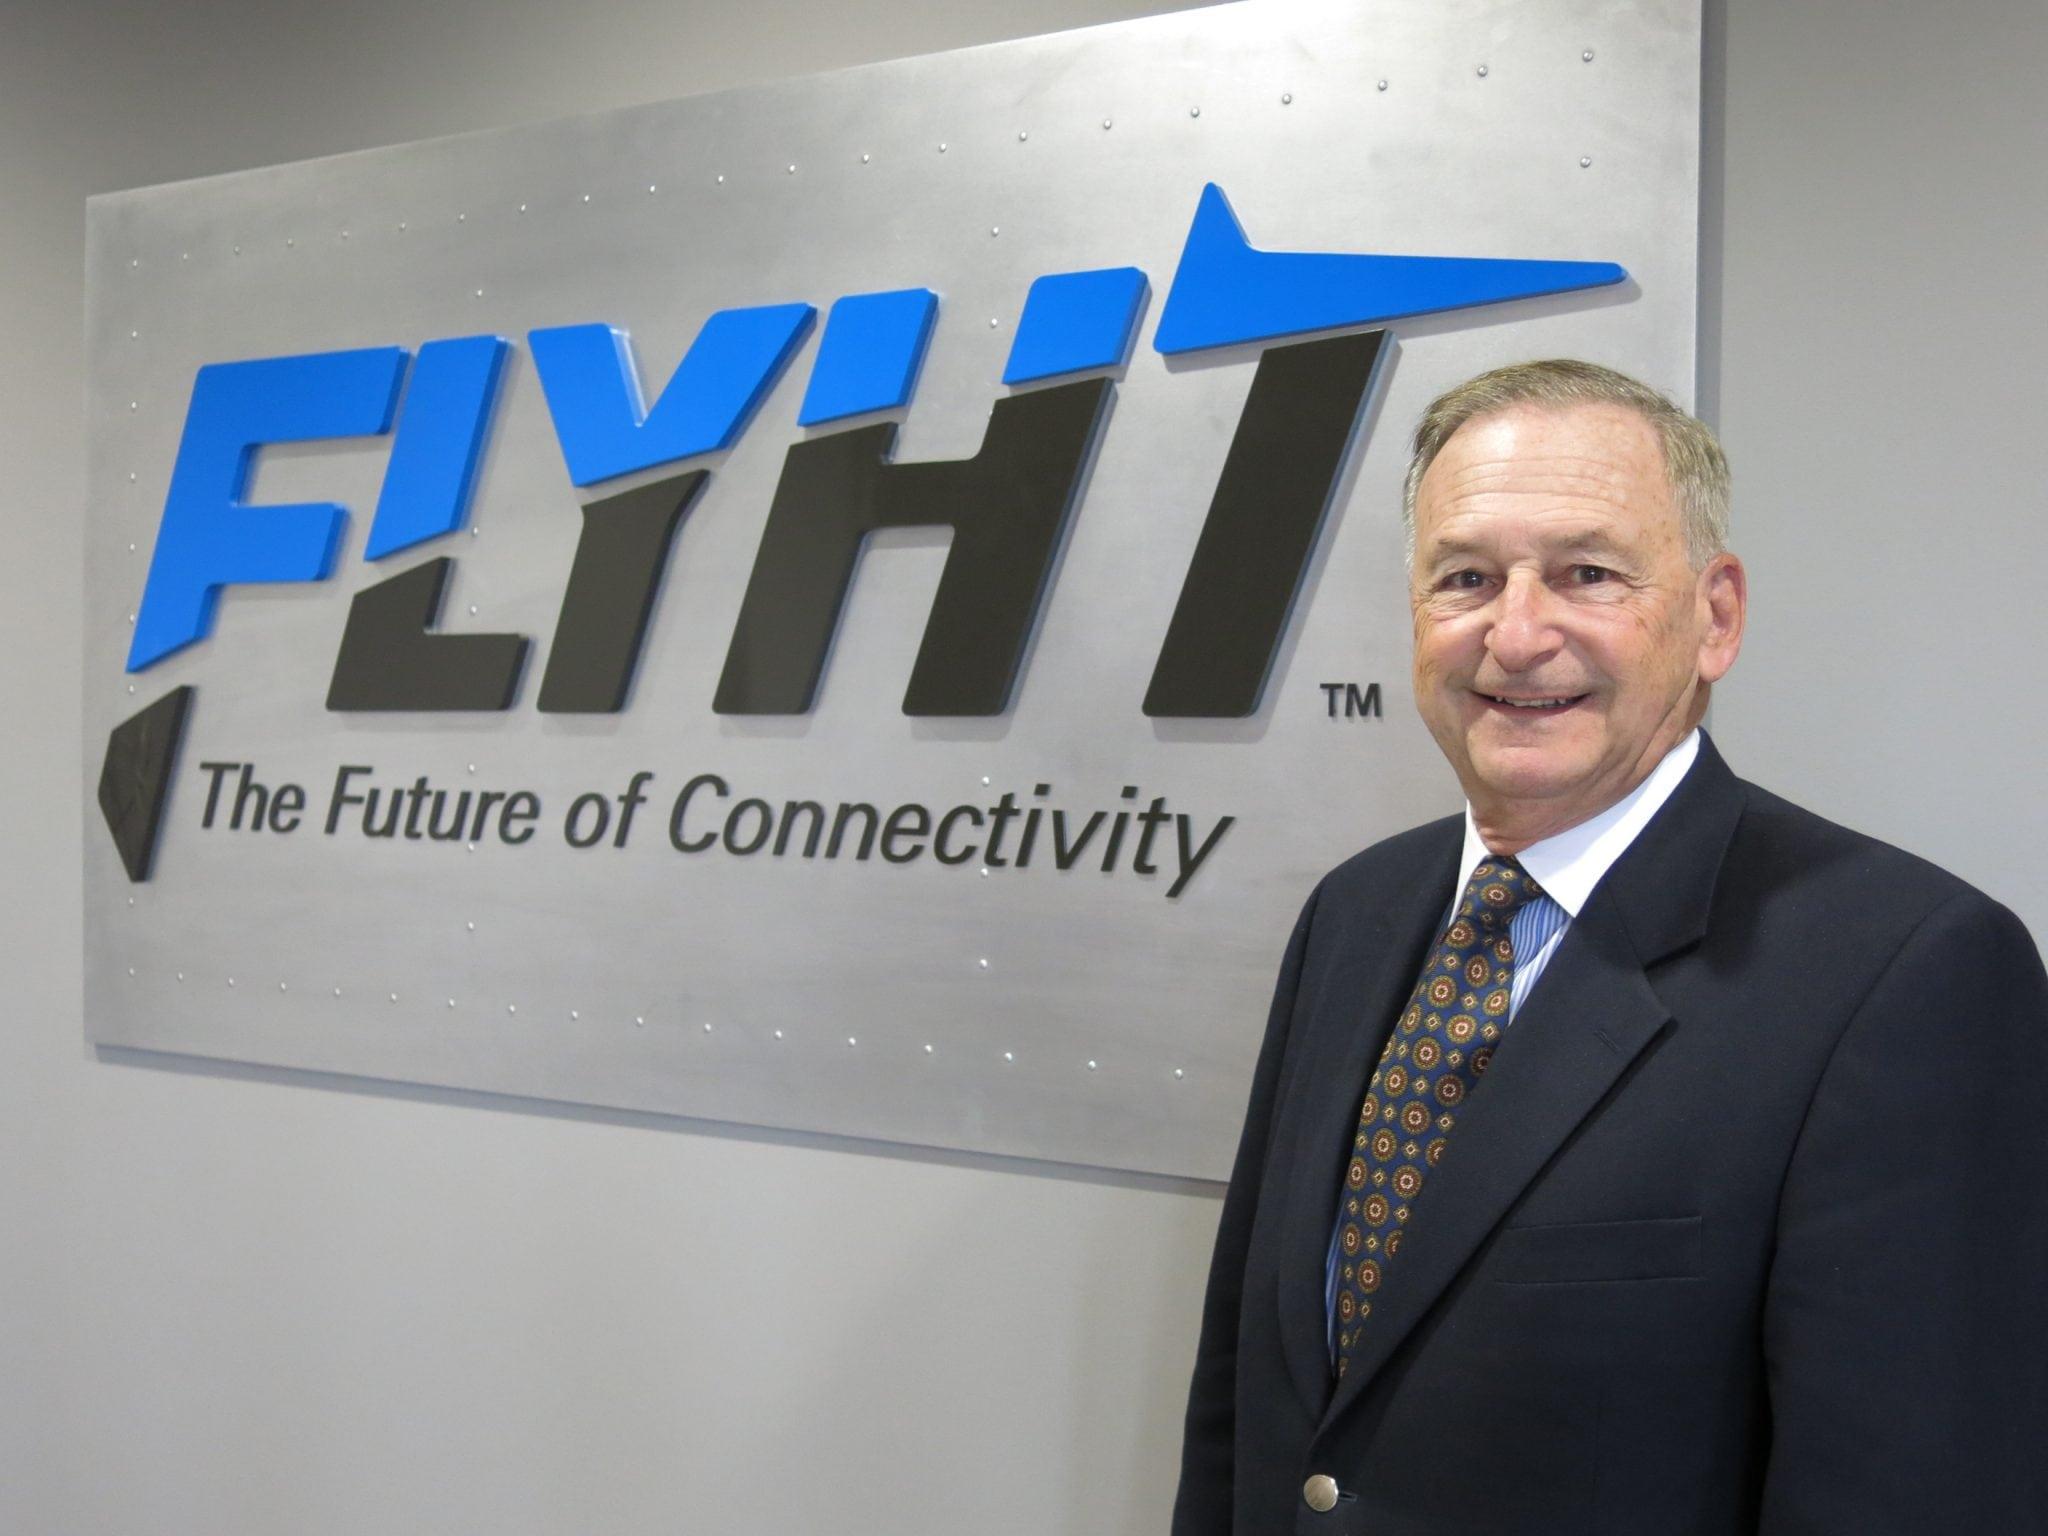 Major General Mark V. Rosenker, elected to Flyht's board of directors